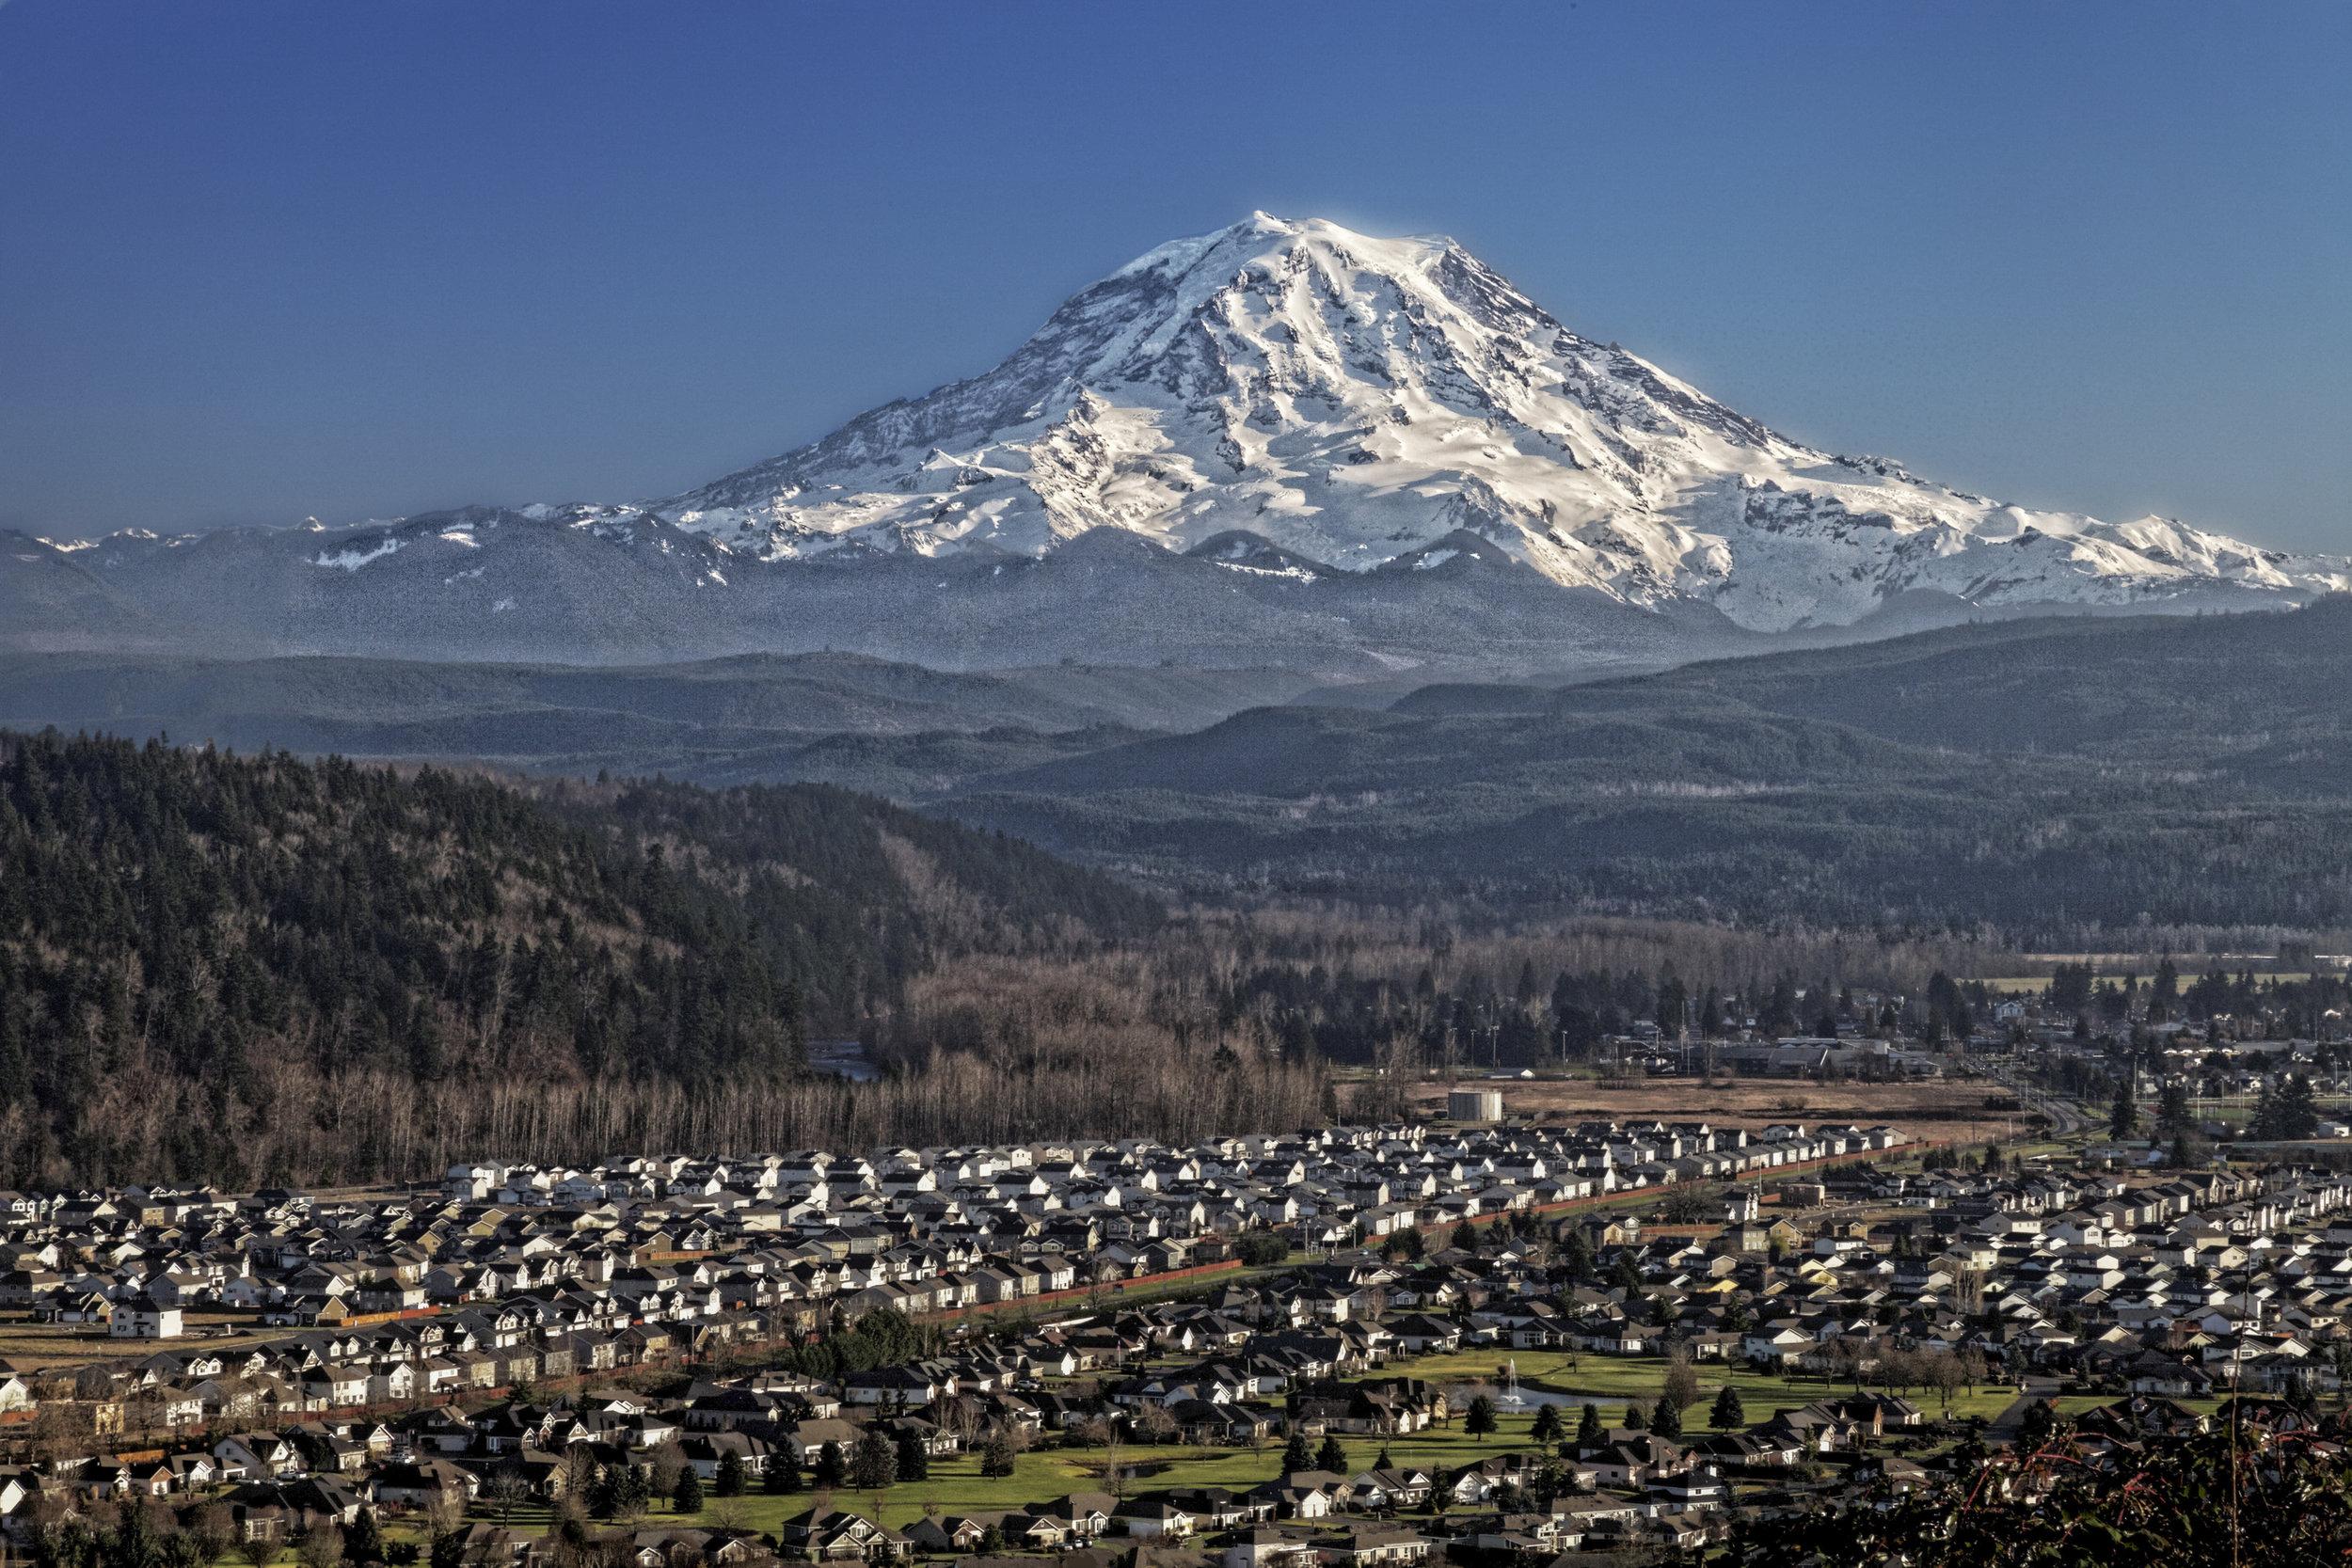 Mount Rainier Looms over the Puyallup Valley, Washington. © USGS